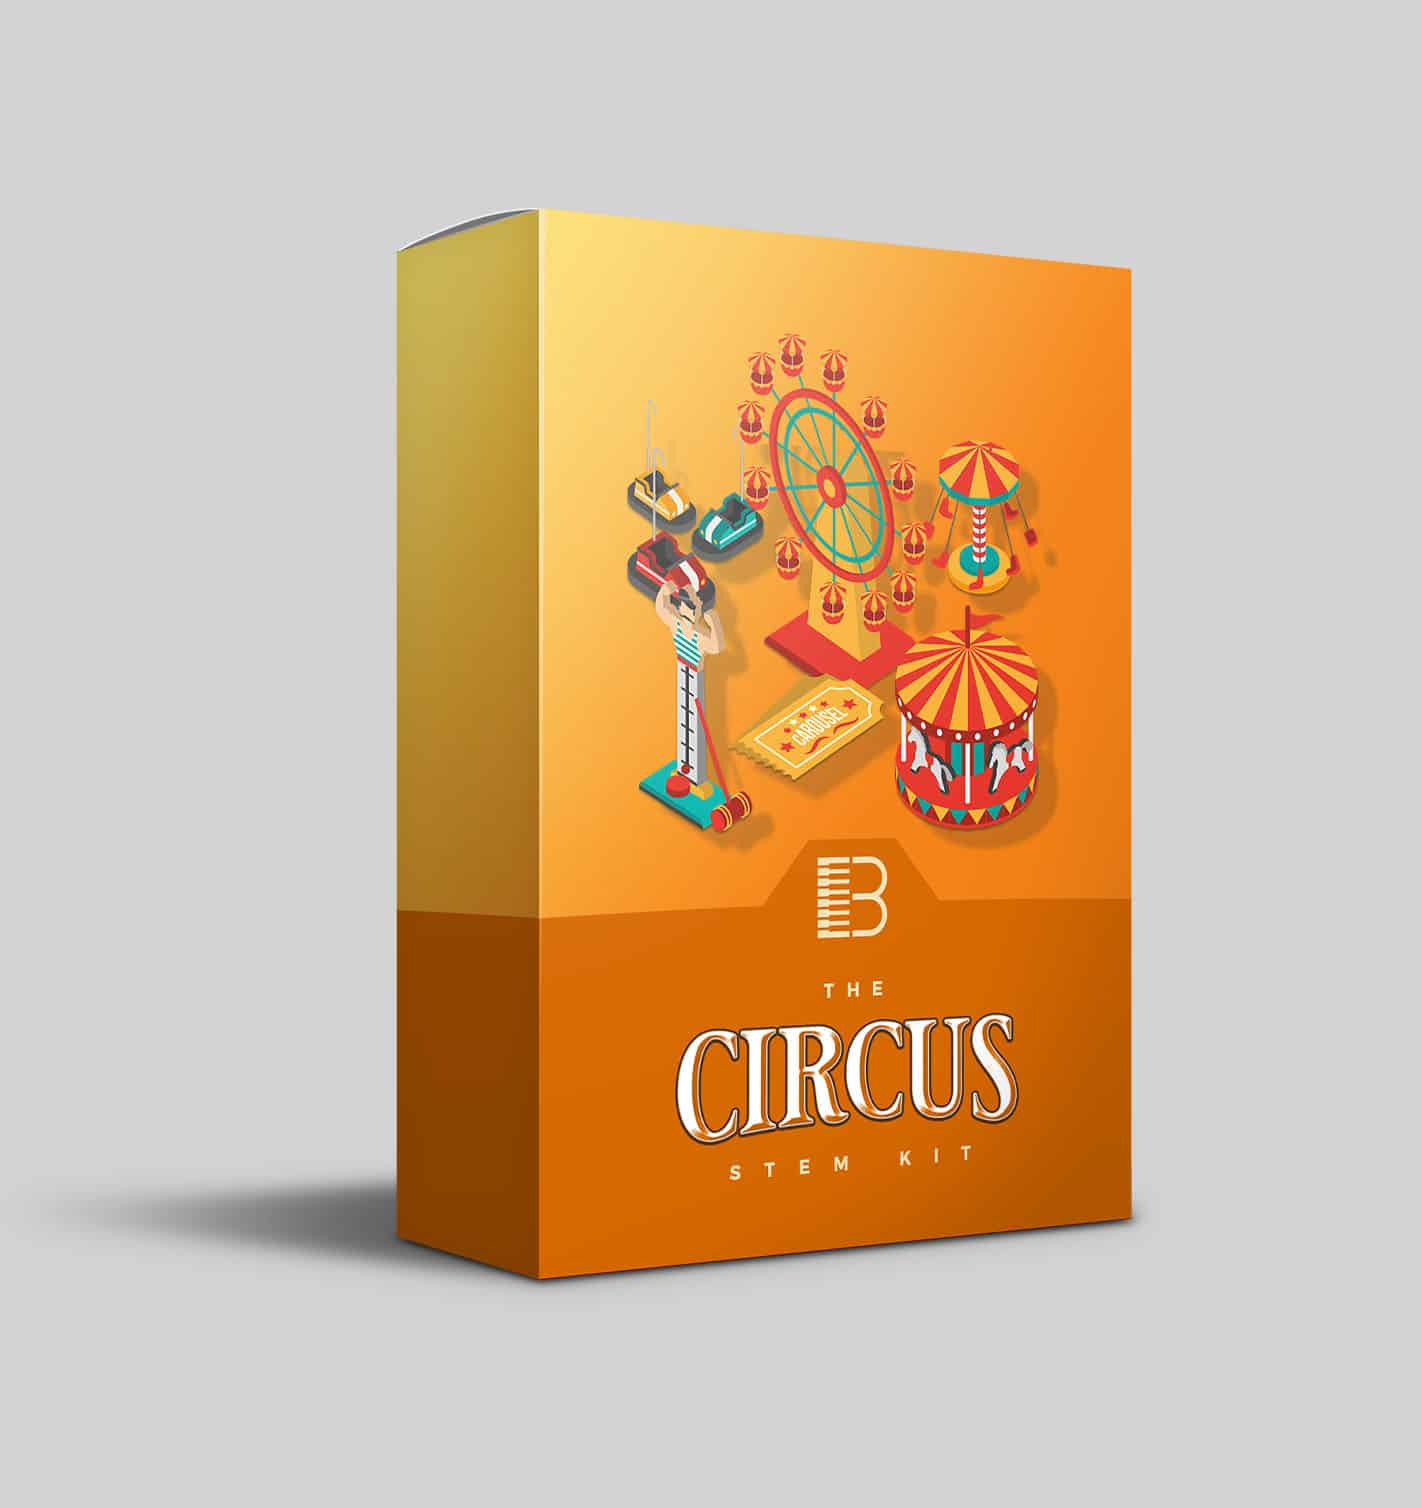 The Circus Loop Kit by Brandon Chapa